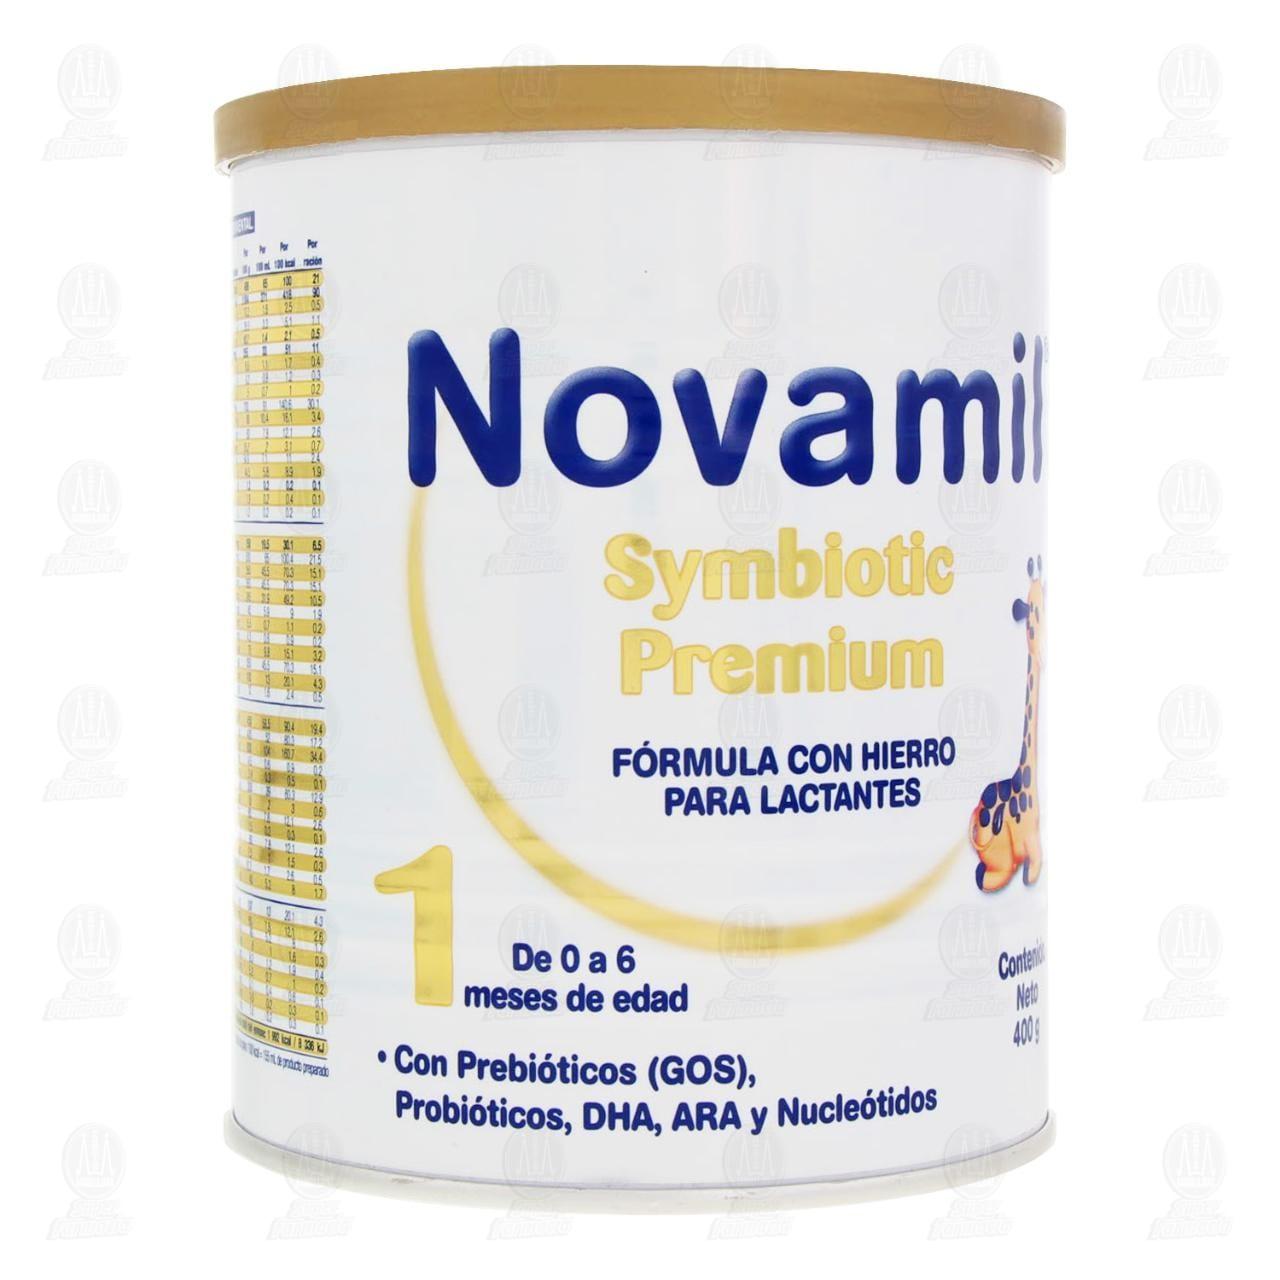 Comprar Fórmula Láctea Novamil Symbiotic Premium Etapa 1 en Polvo (Edad 0-6 Meses), 400 gr. en Farmacias Guadalajara